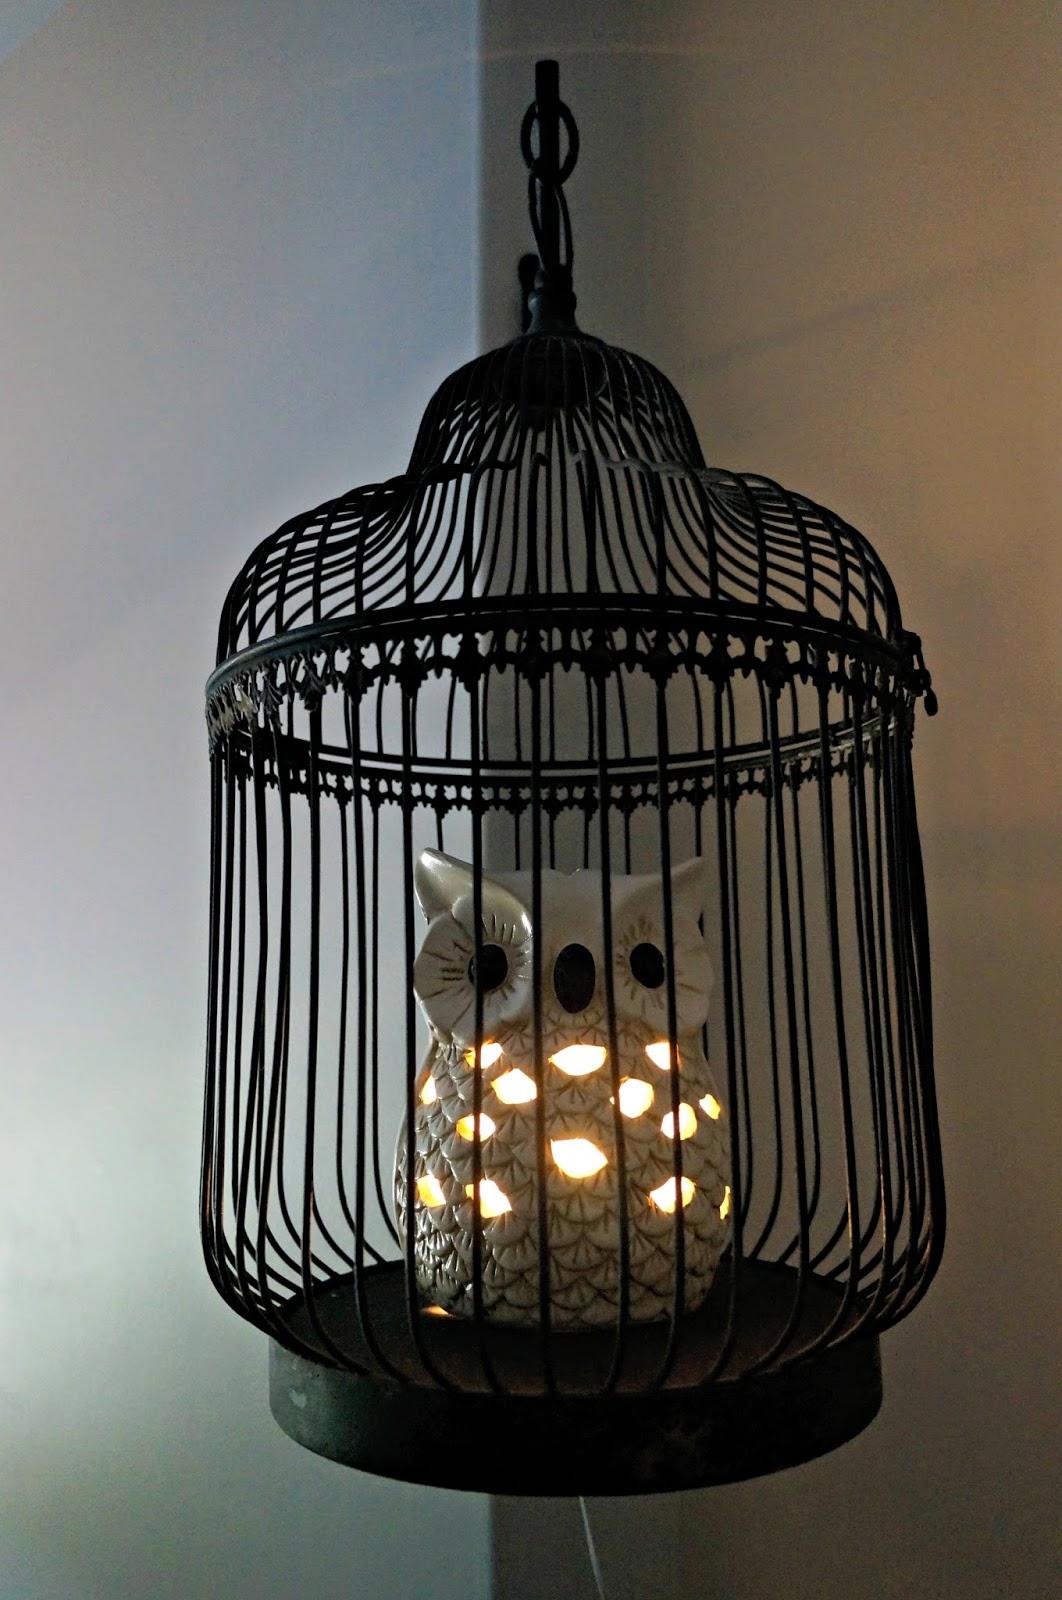 Untitledunderlined finished harry potter nursery - Birdhouse nightlight ...